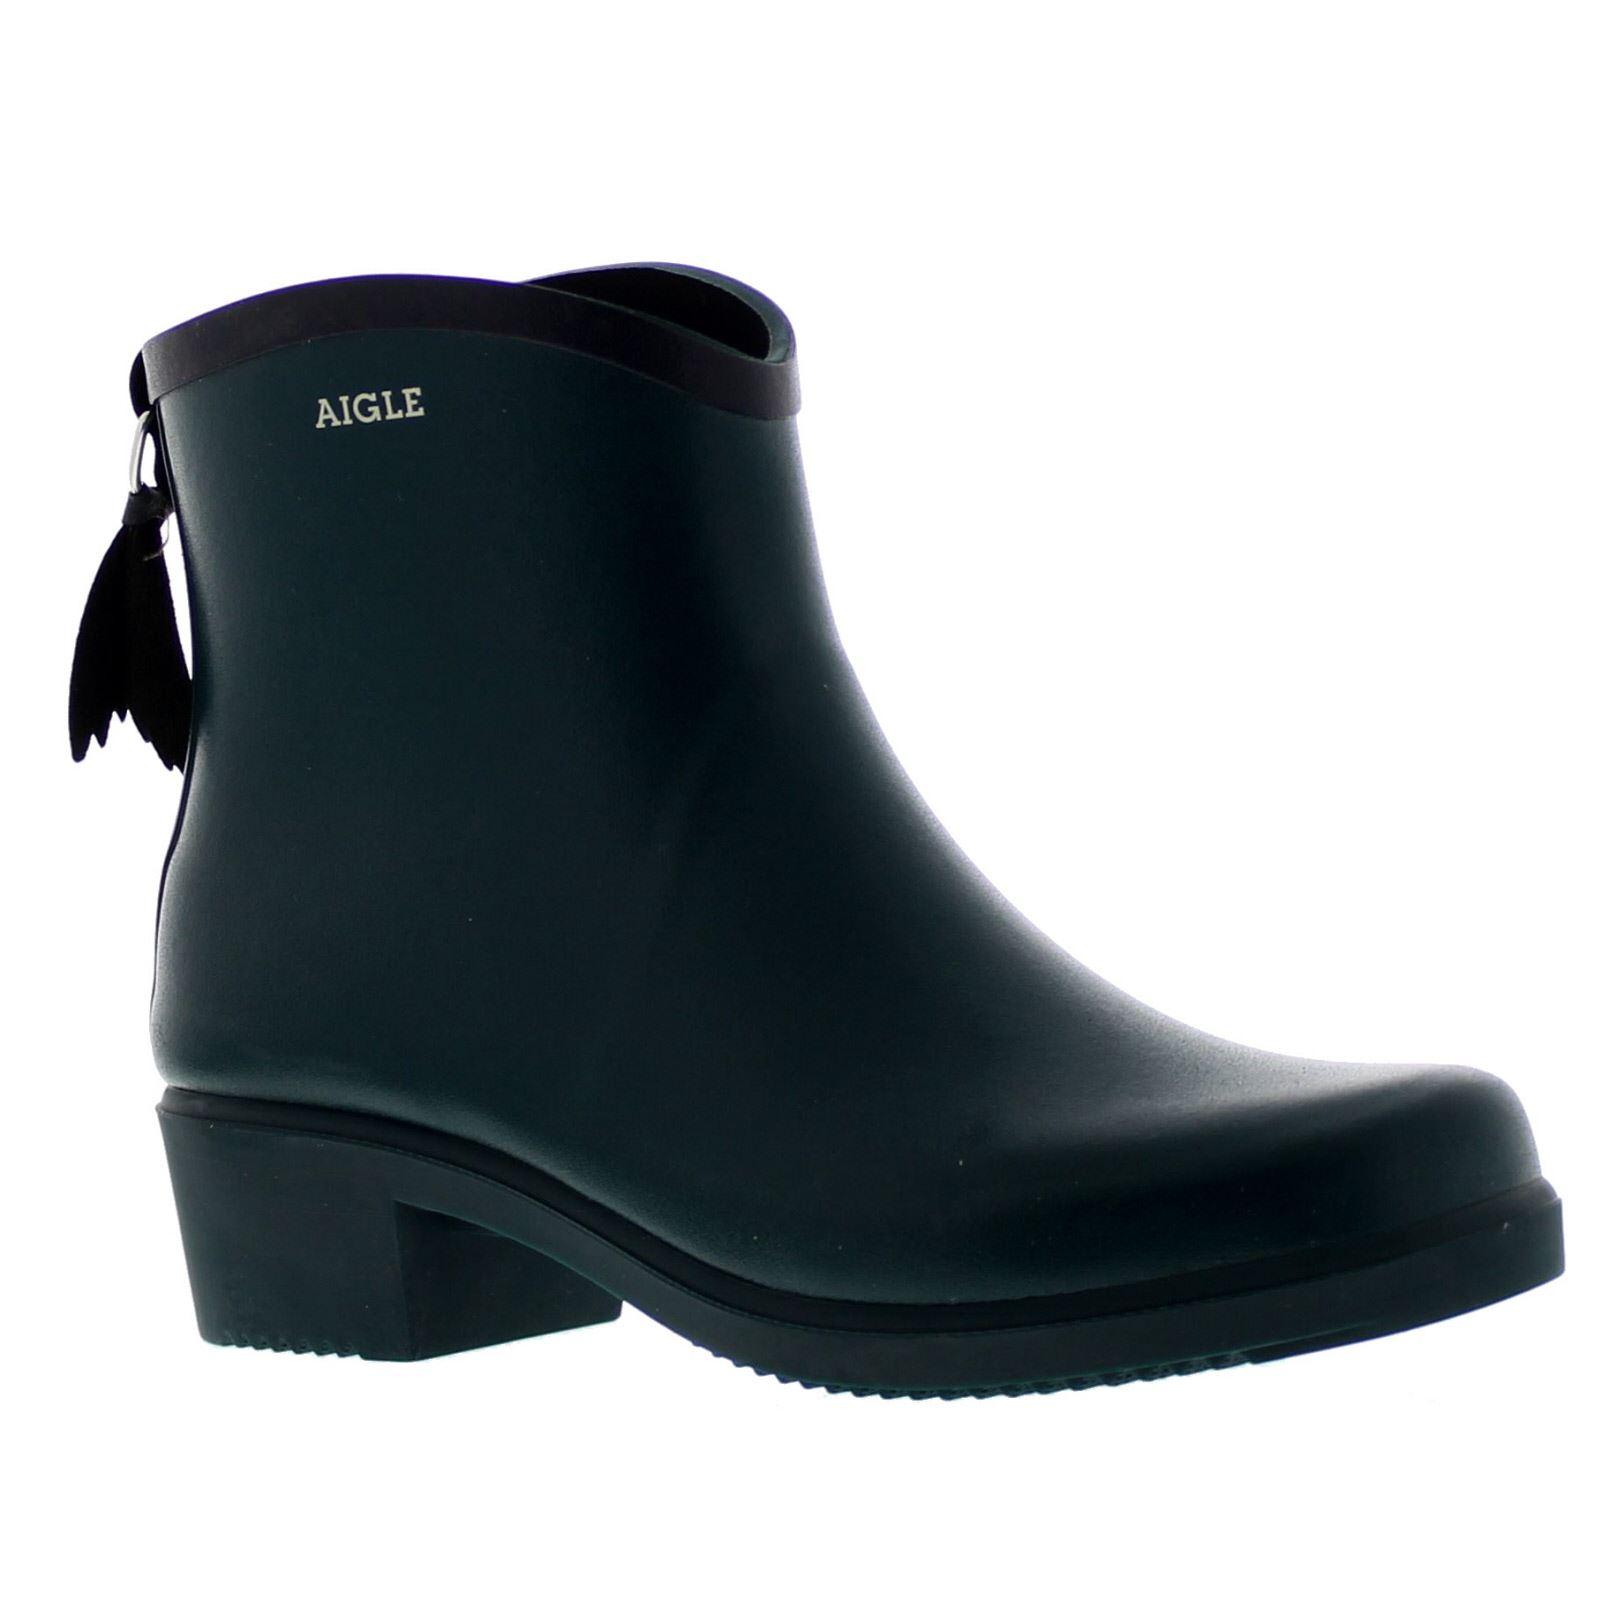 e11fac0cae8ec Aigle Miss Juliette Bottillon Pinede Marine Womens Rubber Wellies Ankle  Boots